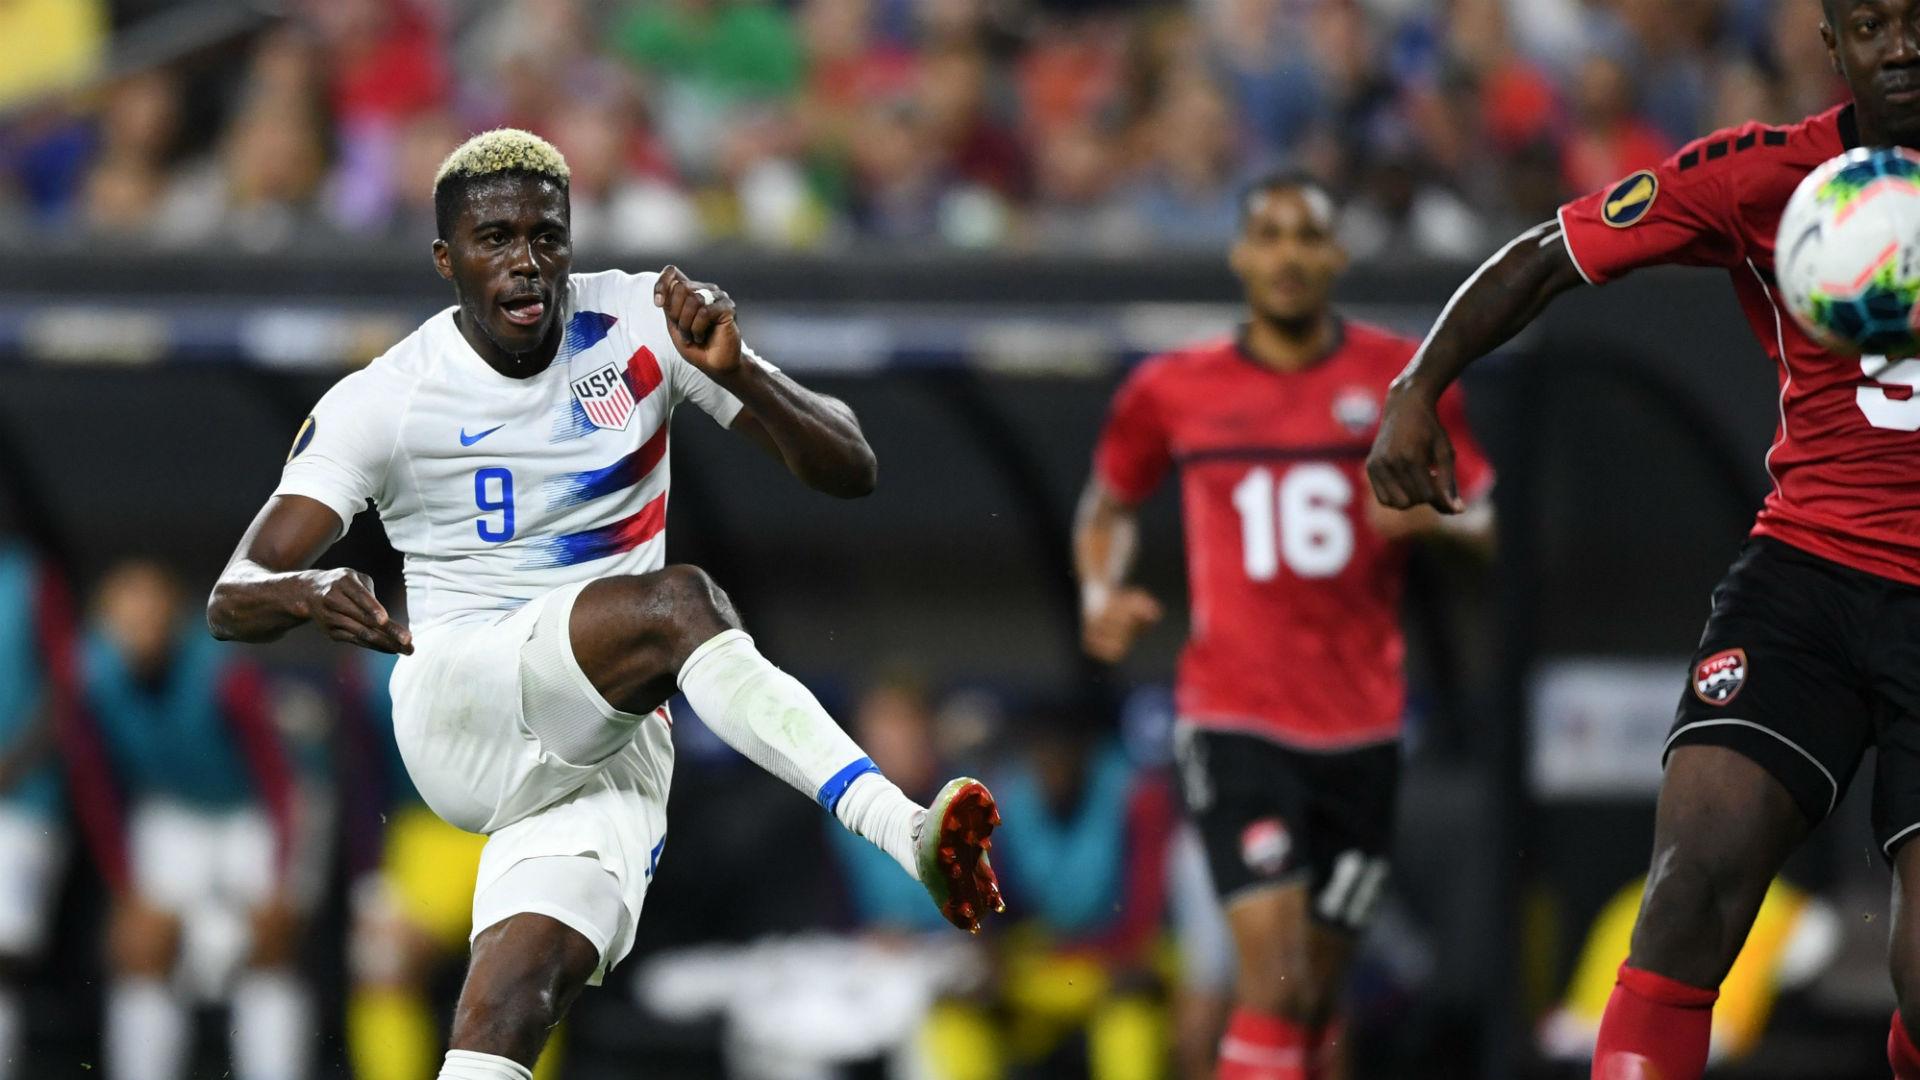 Gyasi Zardes USA USMNT Trinidad and Tobago Gold Cup 2019